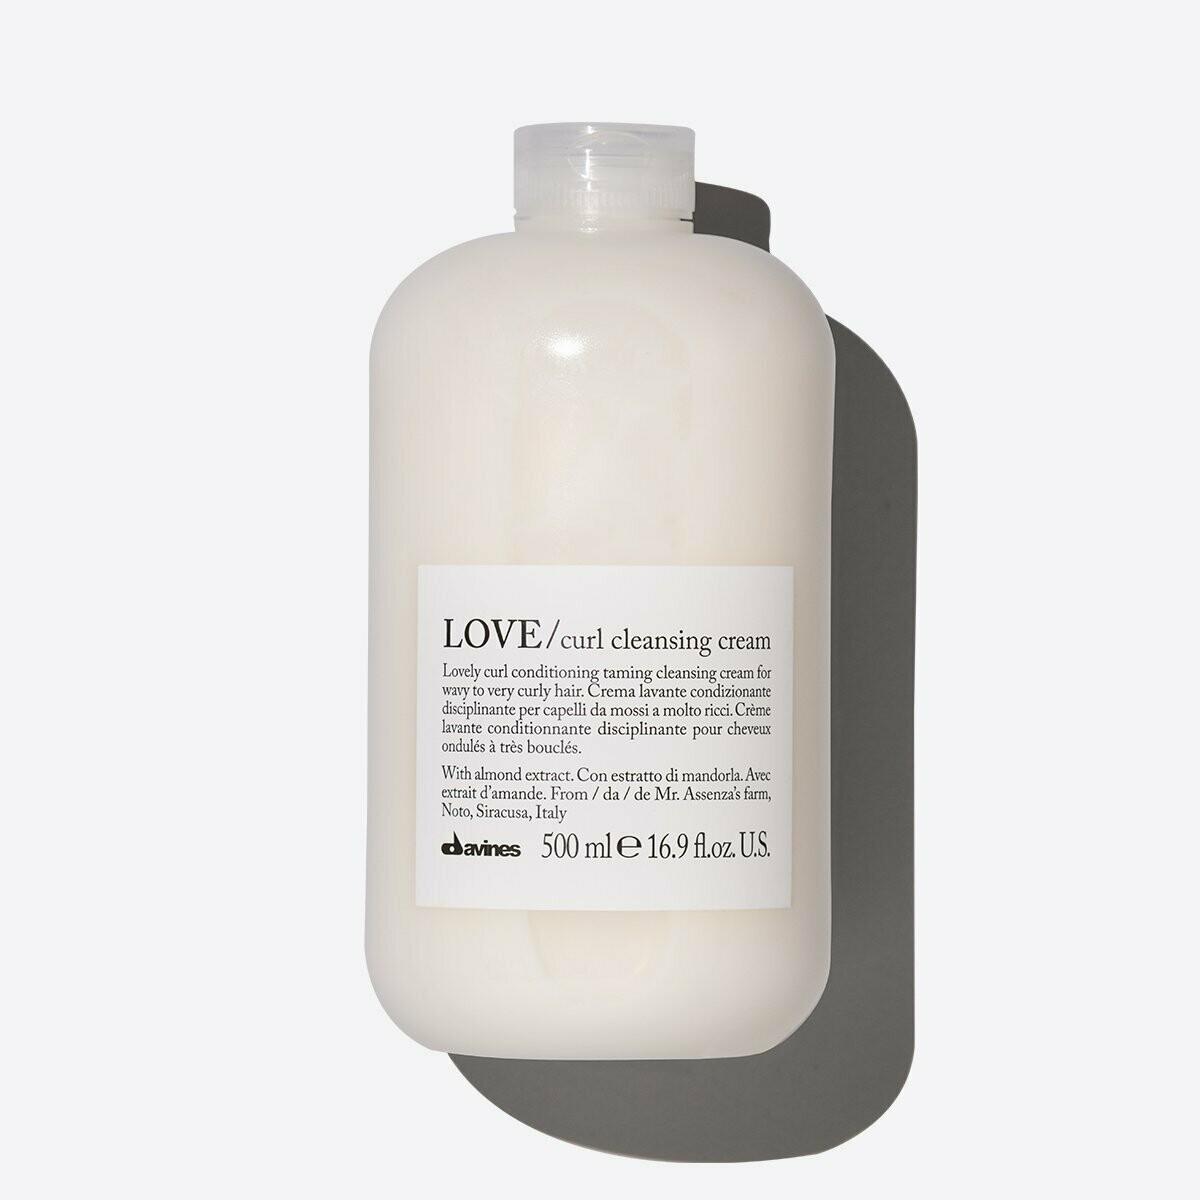 LOVE CURL Cleansing Cream 500ml